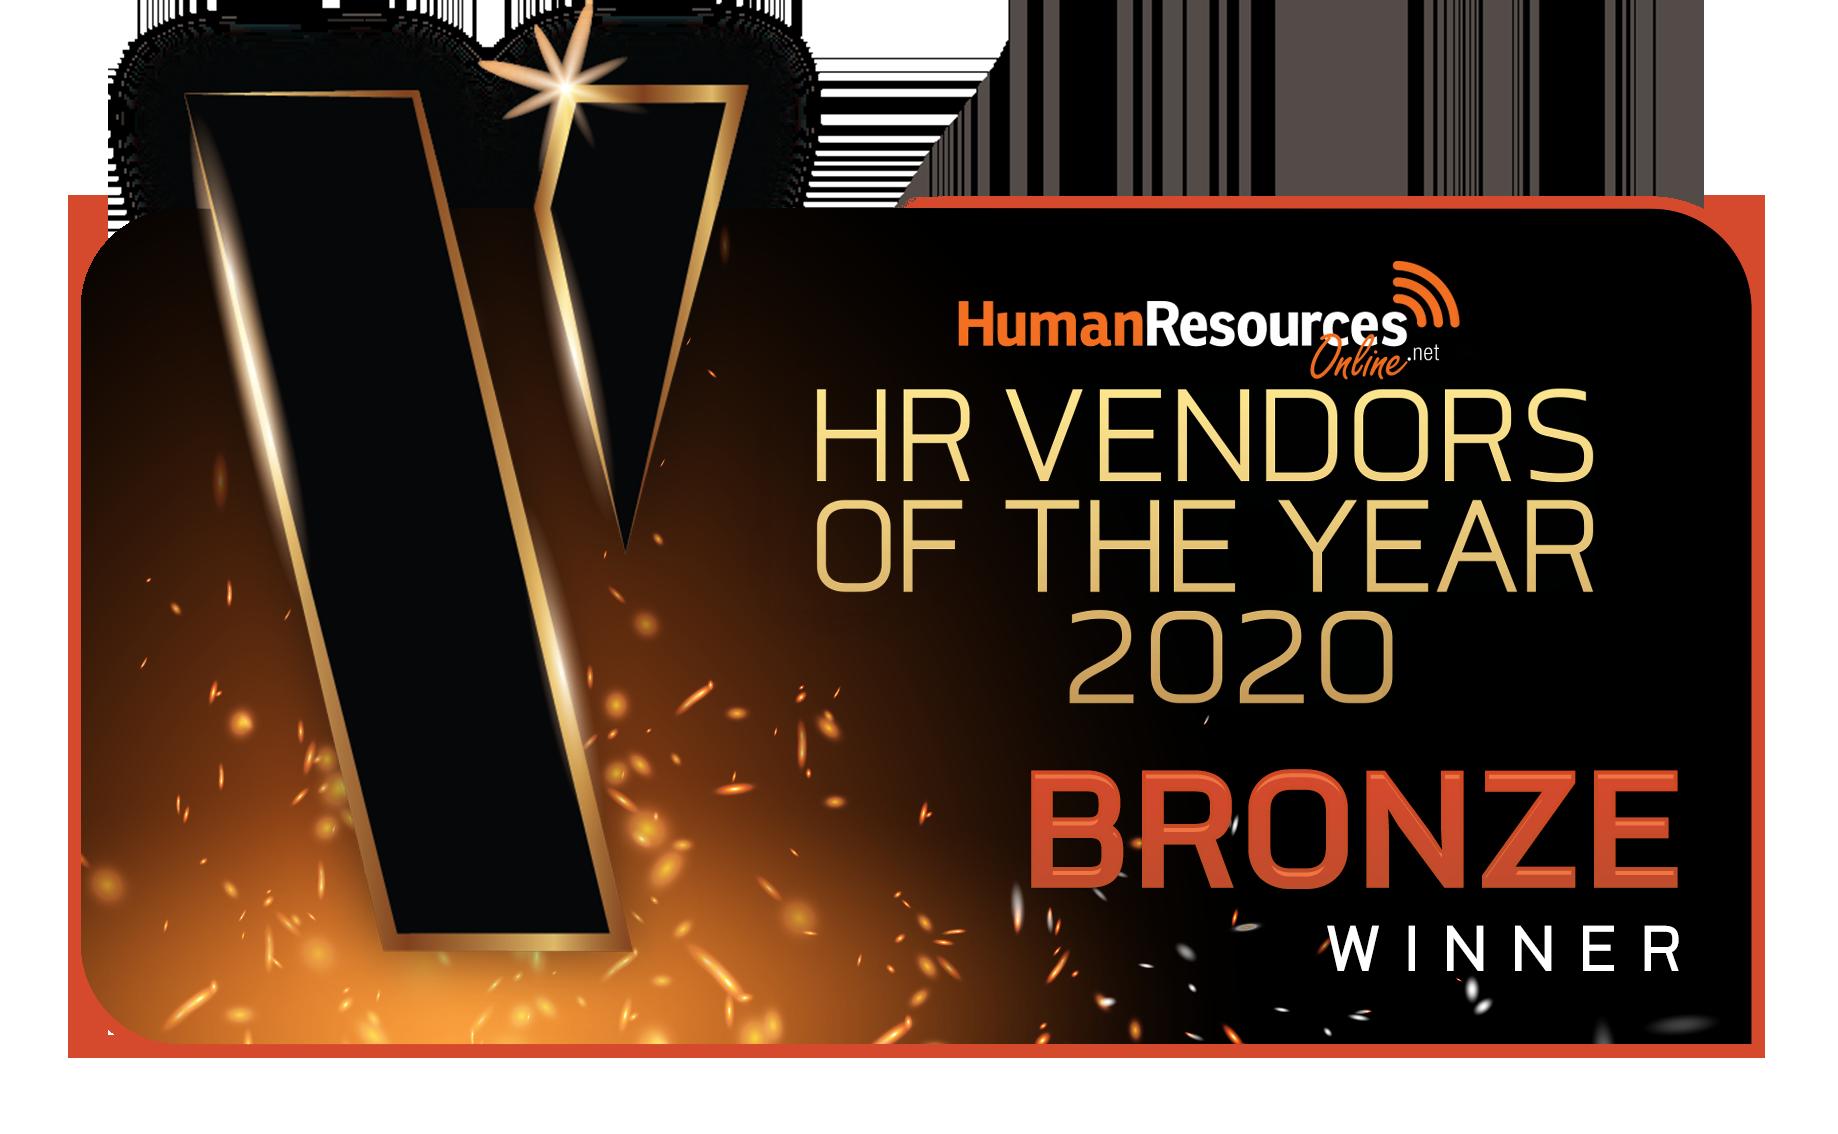 voty2020_badge_bronze_winner